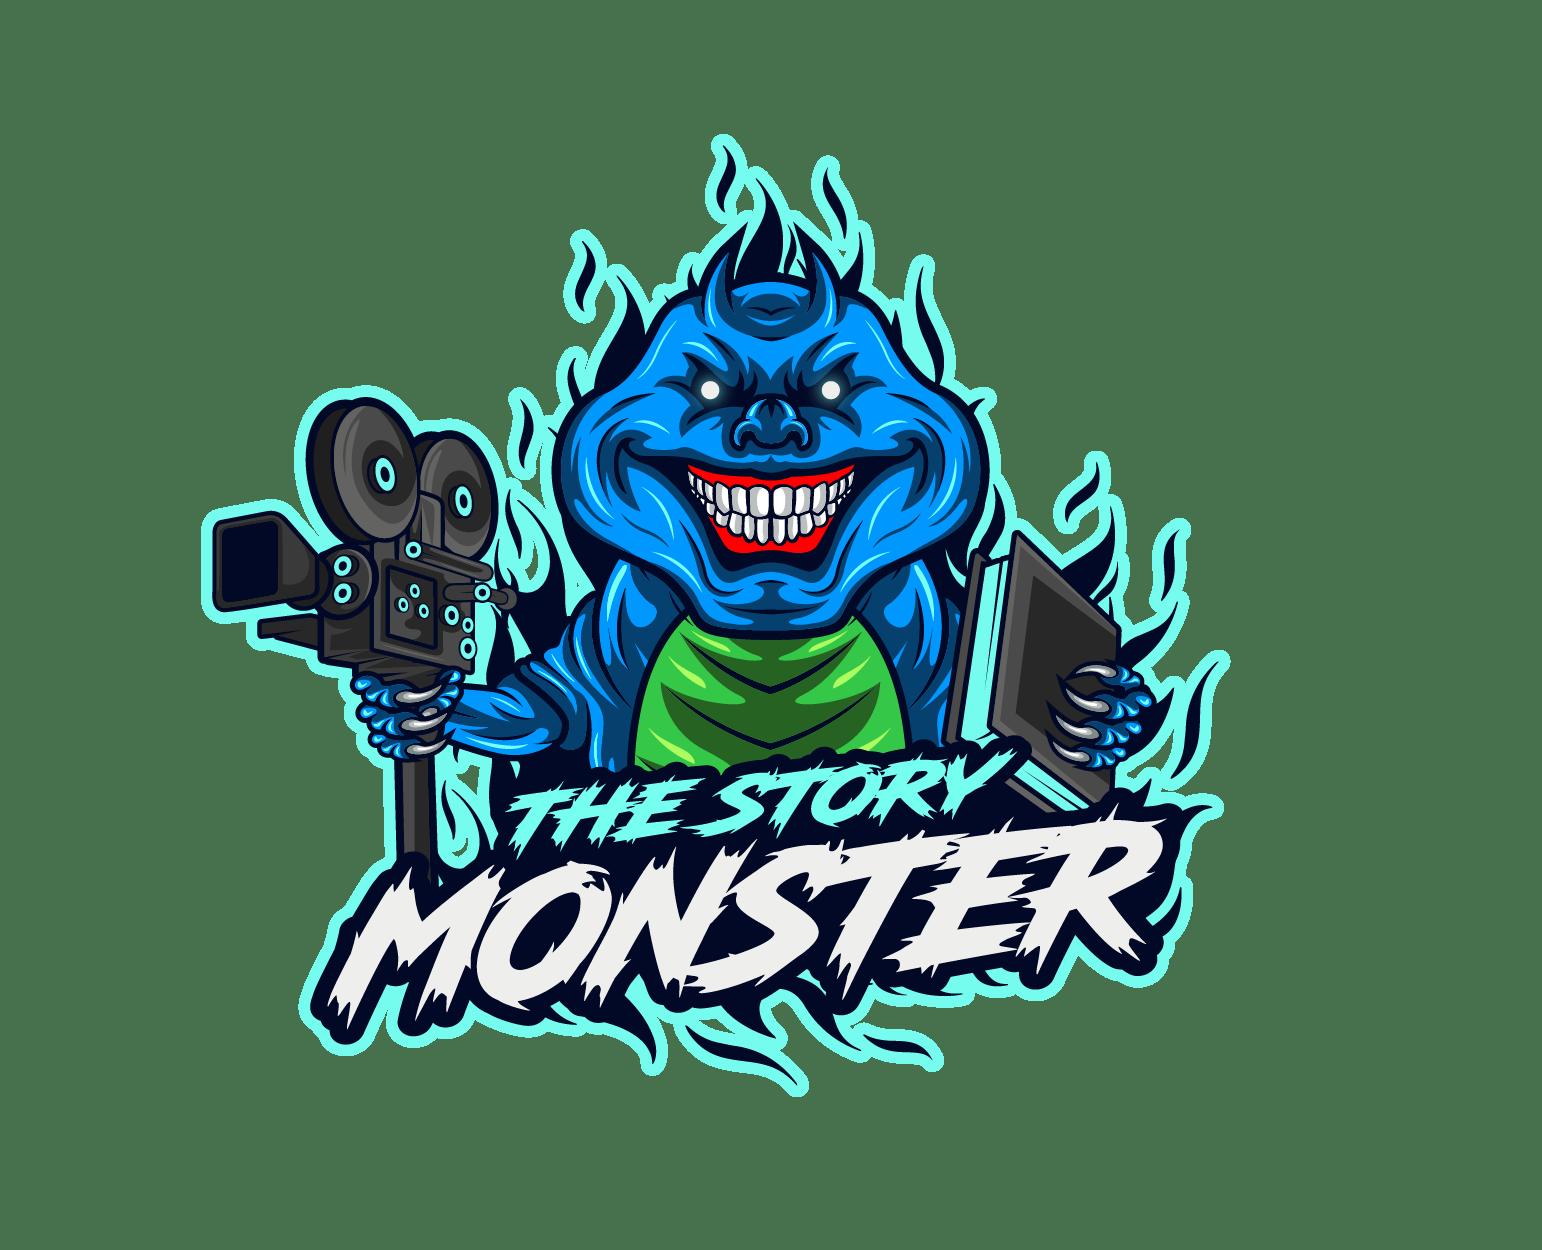 The Story Monster